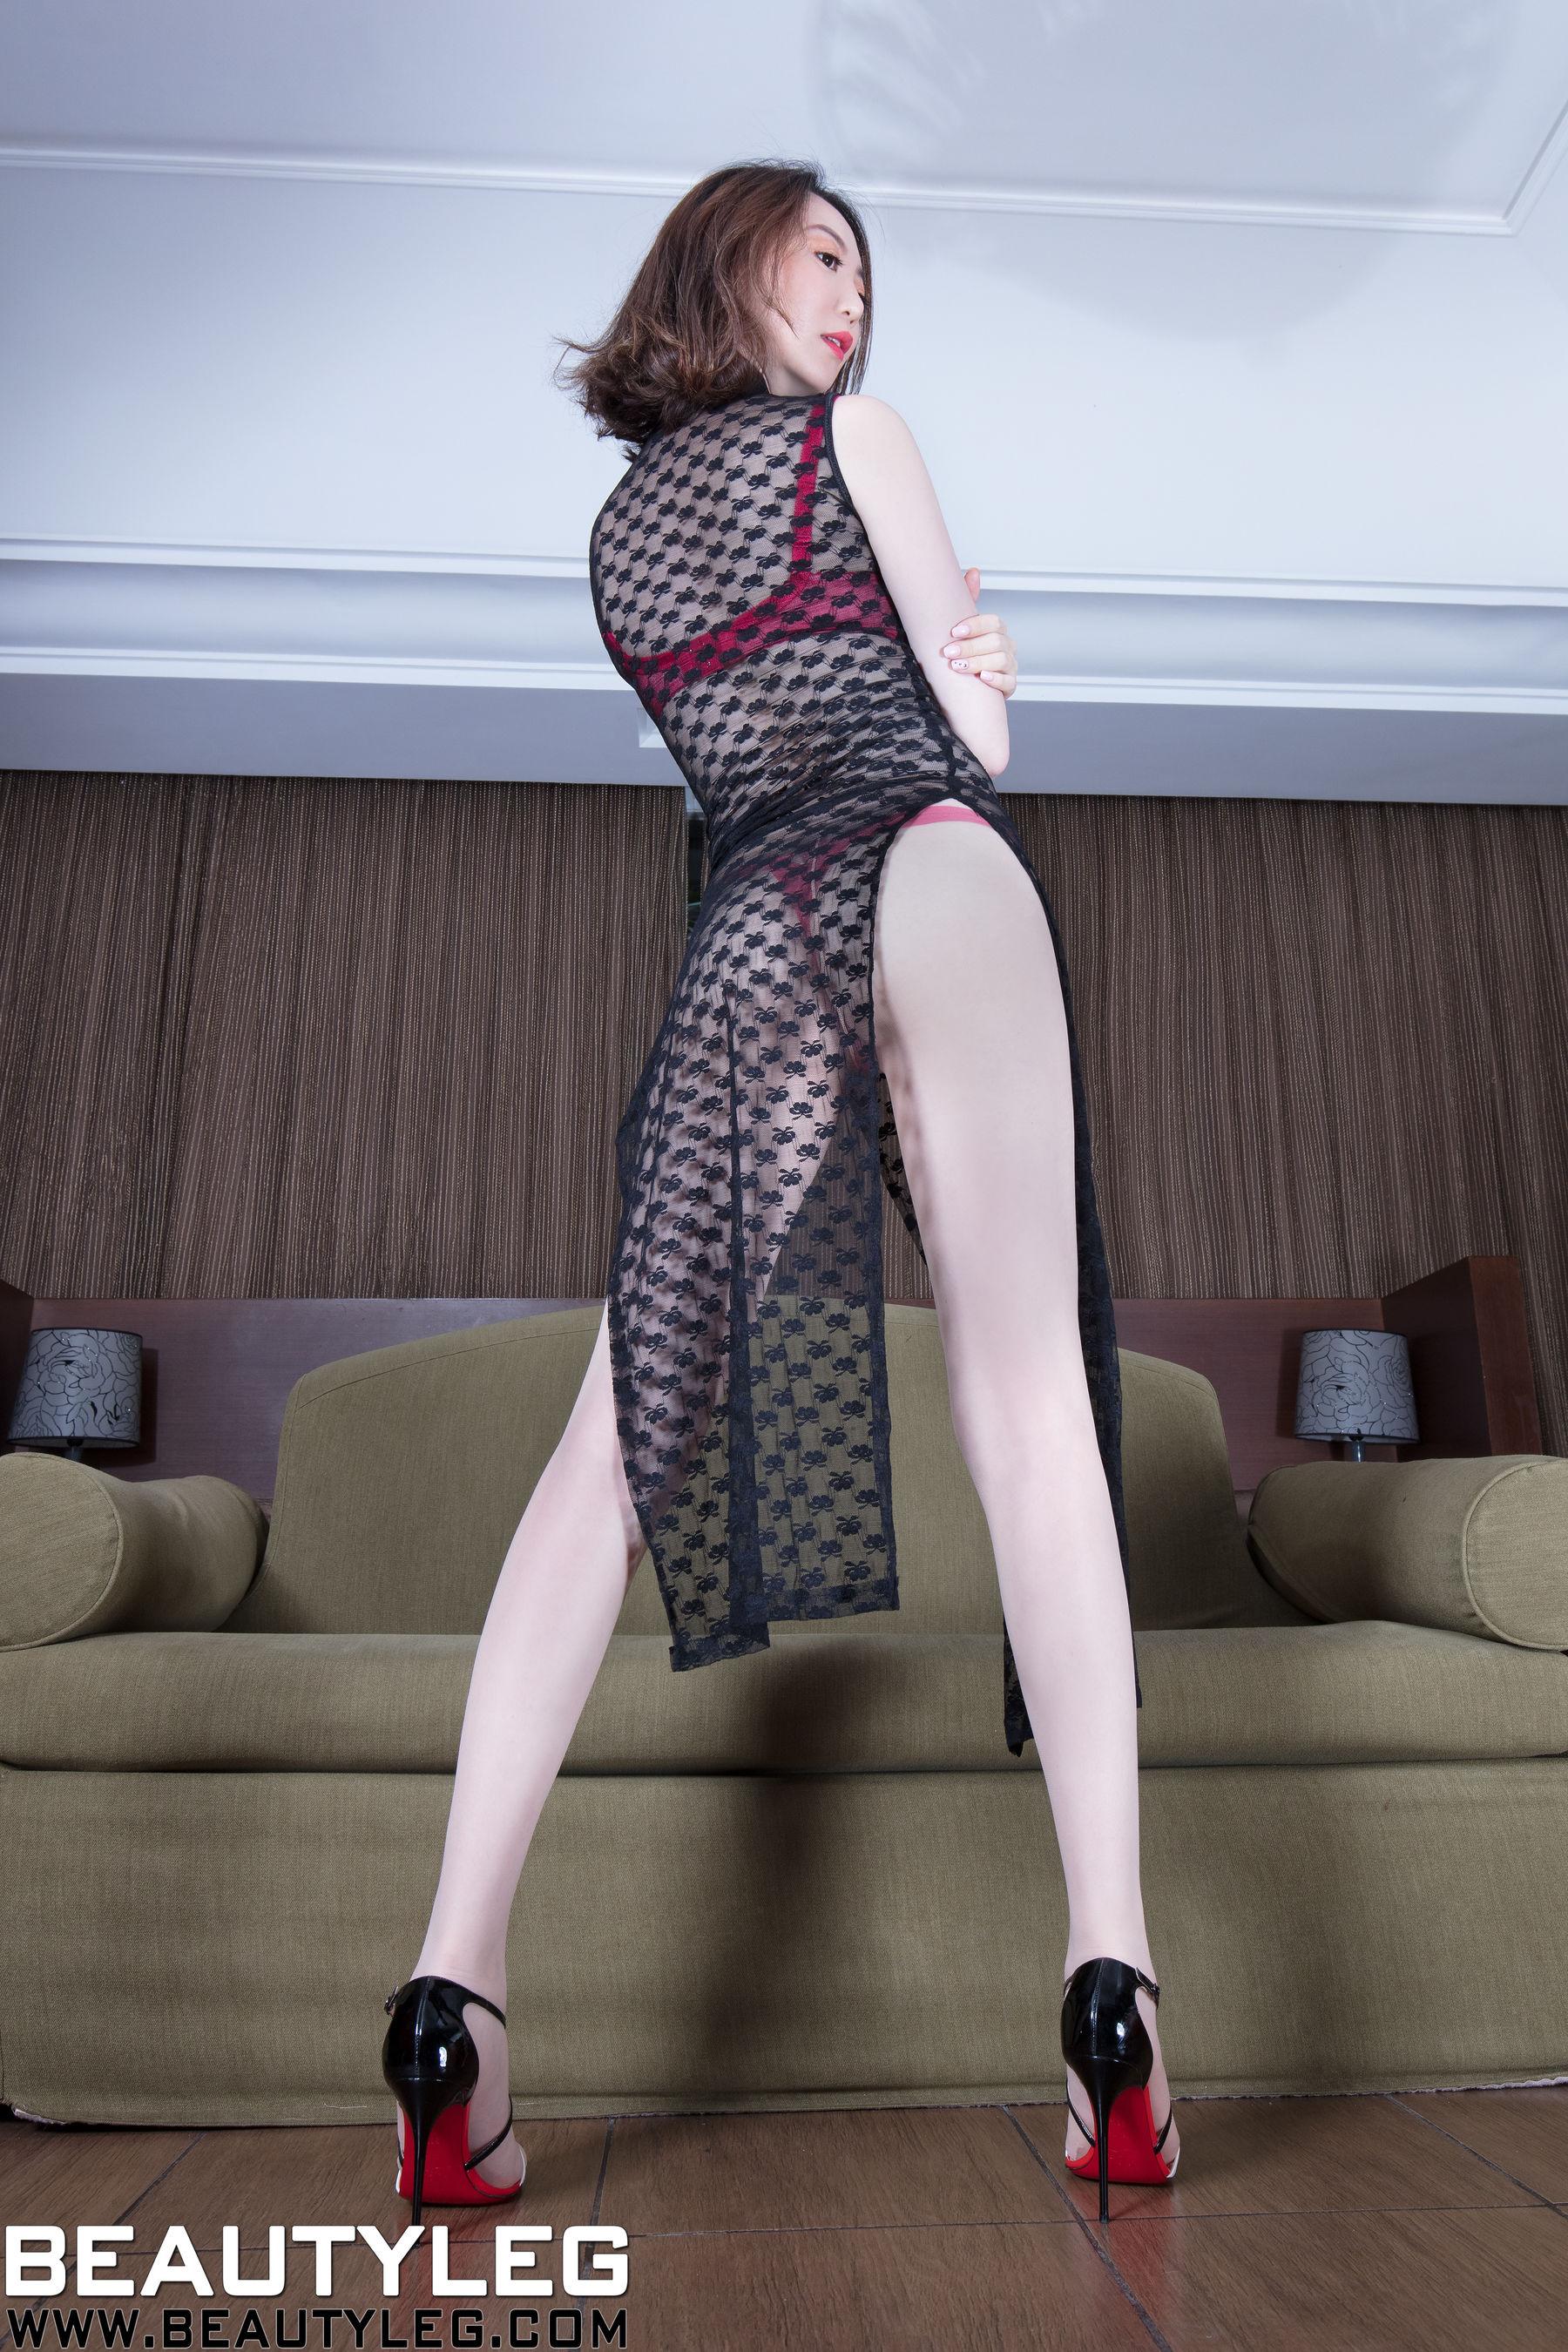 VOL.1599 [Beautyleg]蕾丝透视美女长腿美女:腿模Clear(Beautyleg Clear)超高清个人性感漂亮大图(50P)